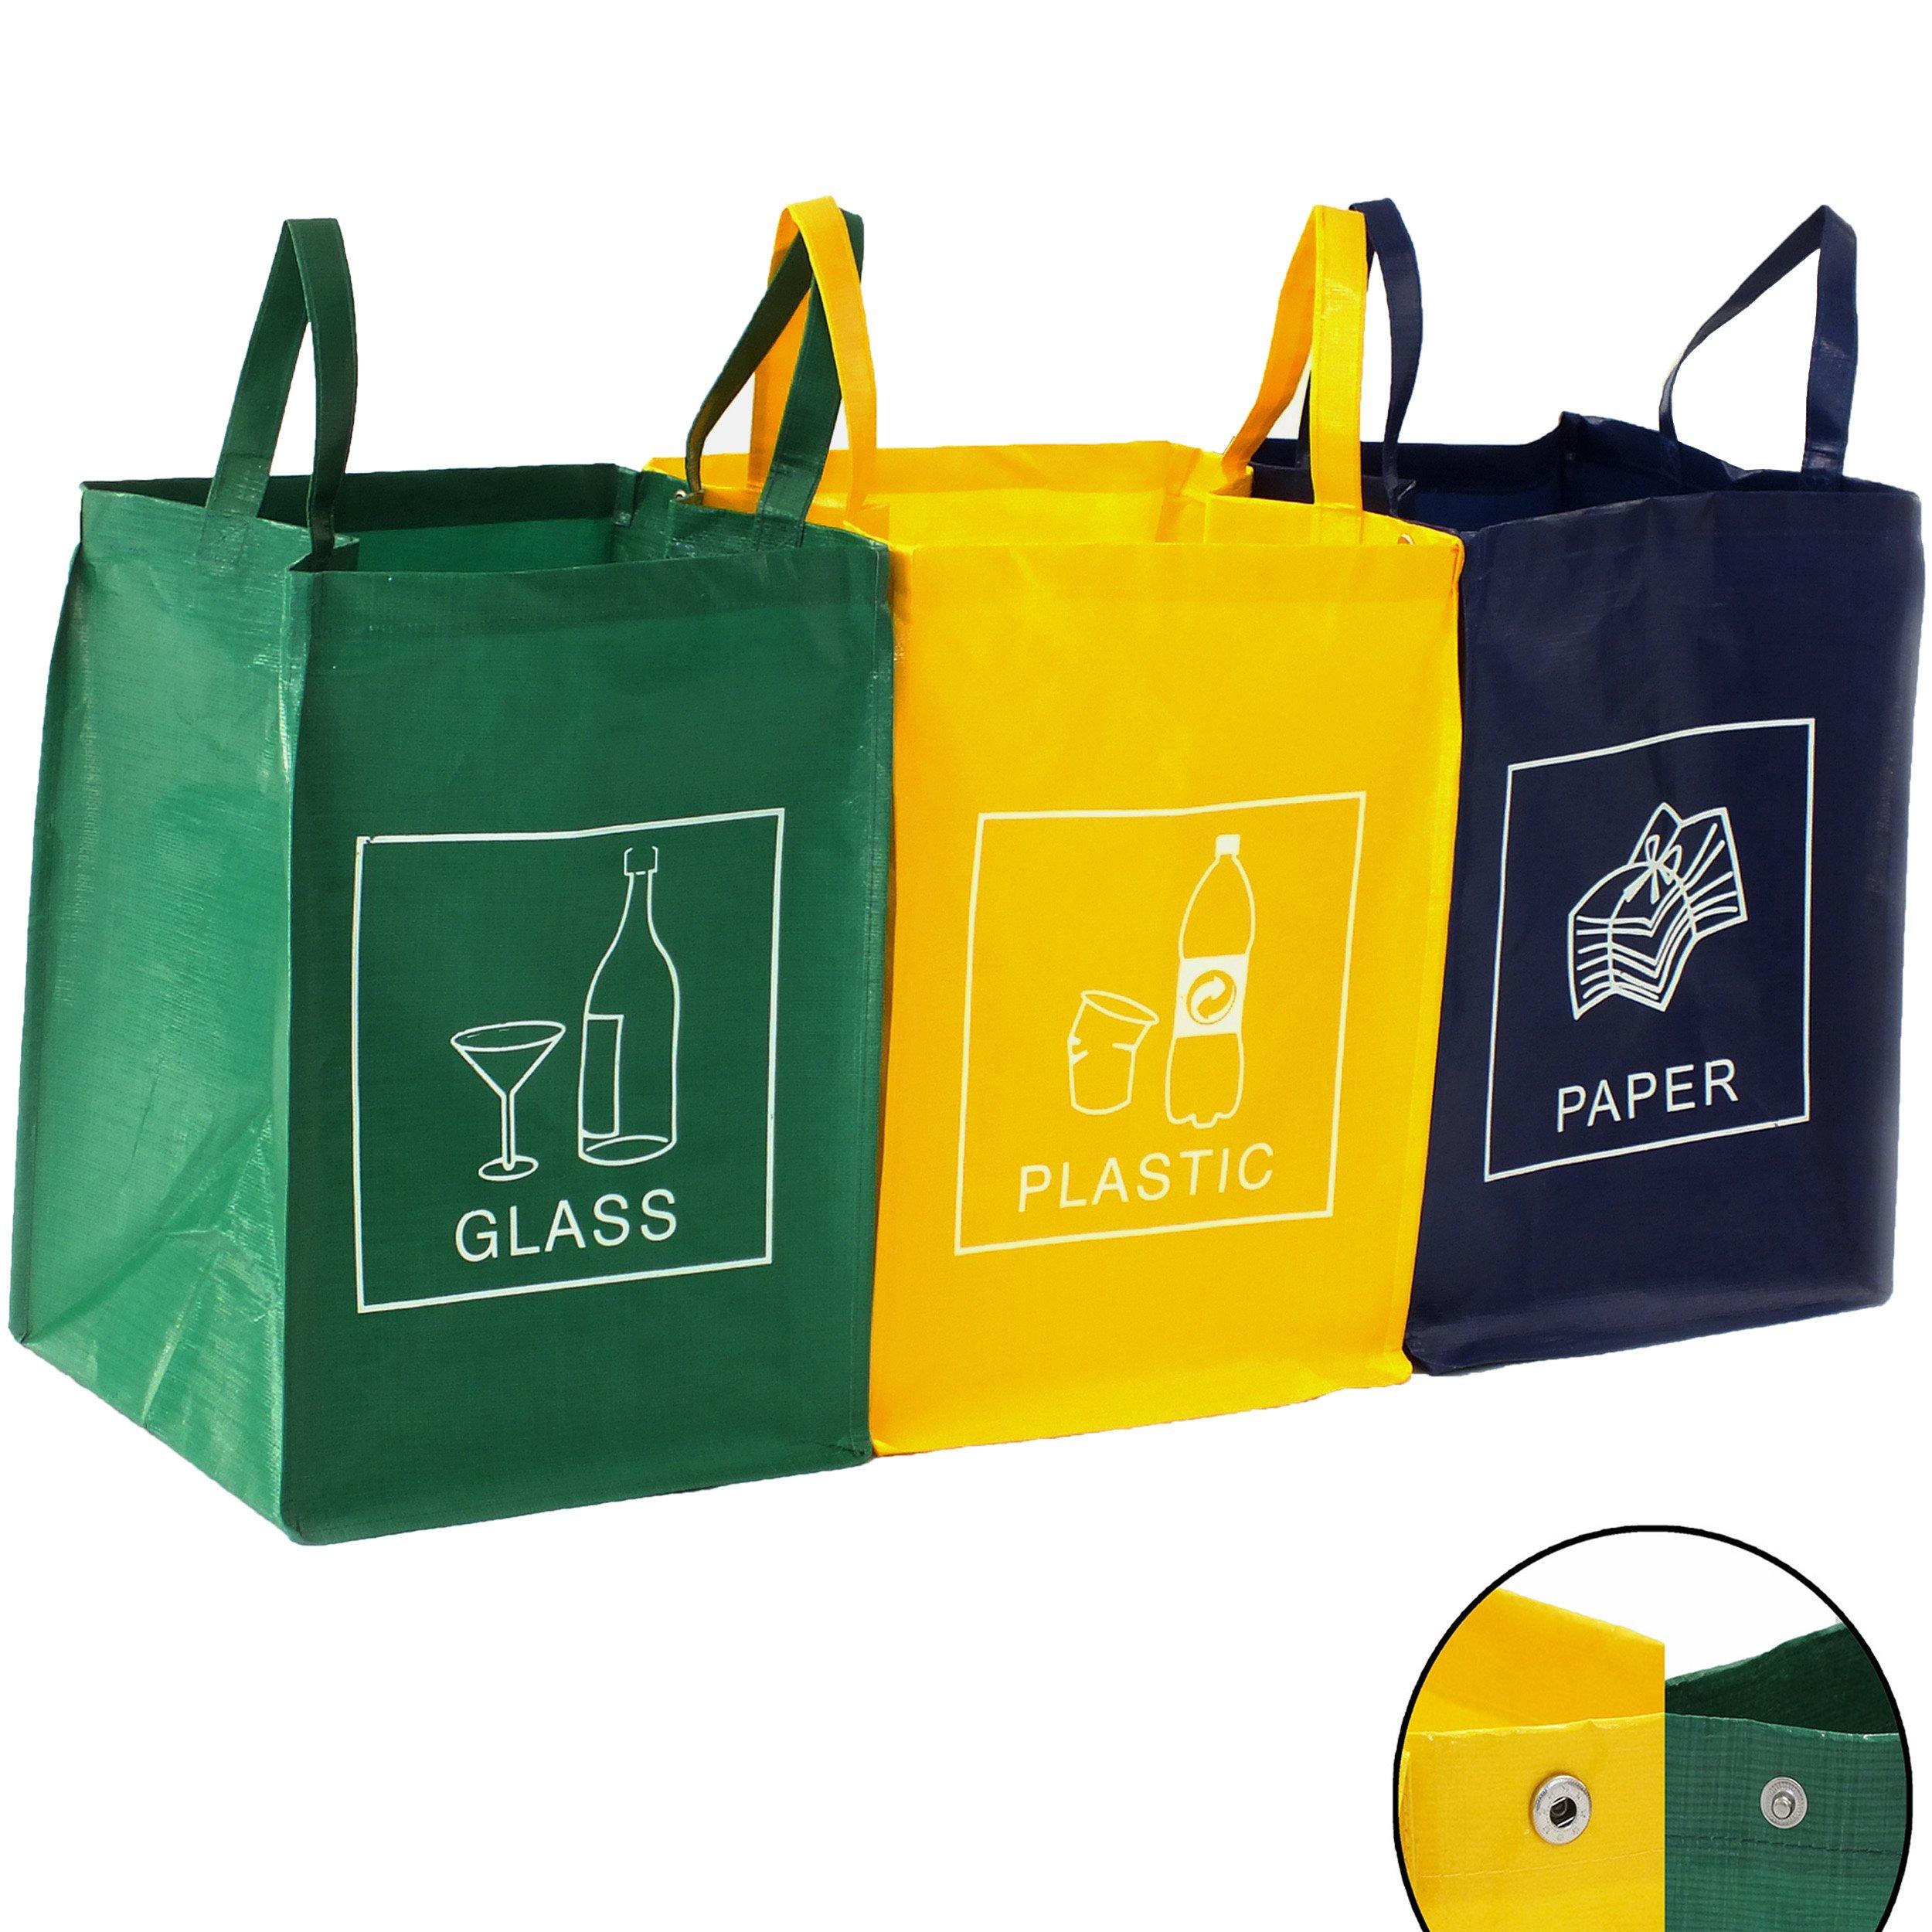 DWD-Company TRESKO Set de 3 bolsas para reciclar basura | Sistema de reciclaje para